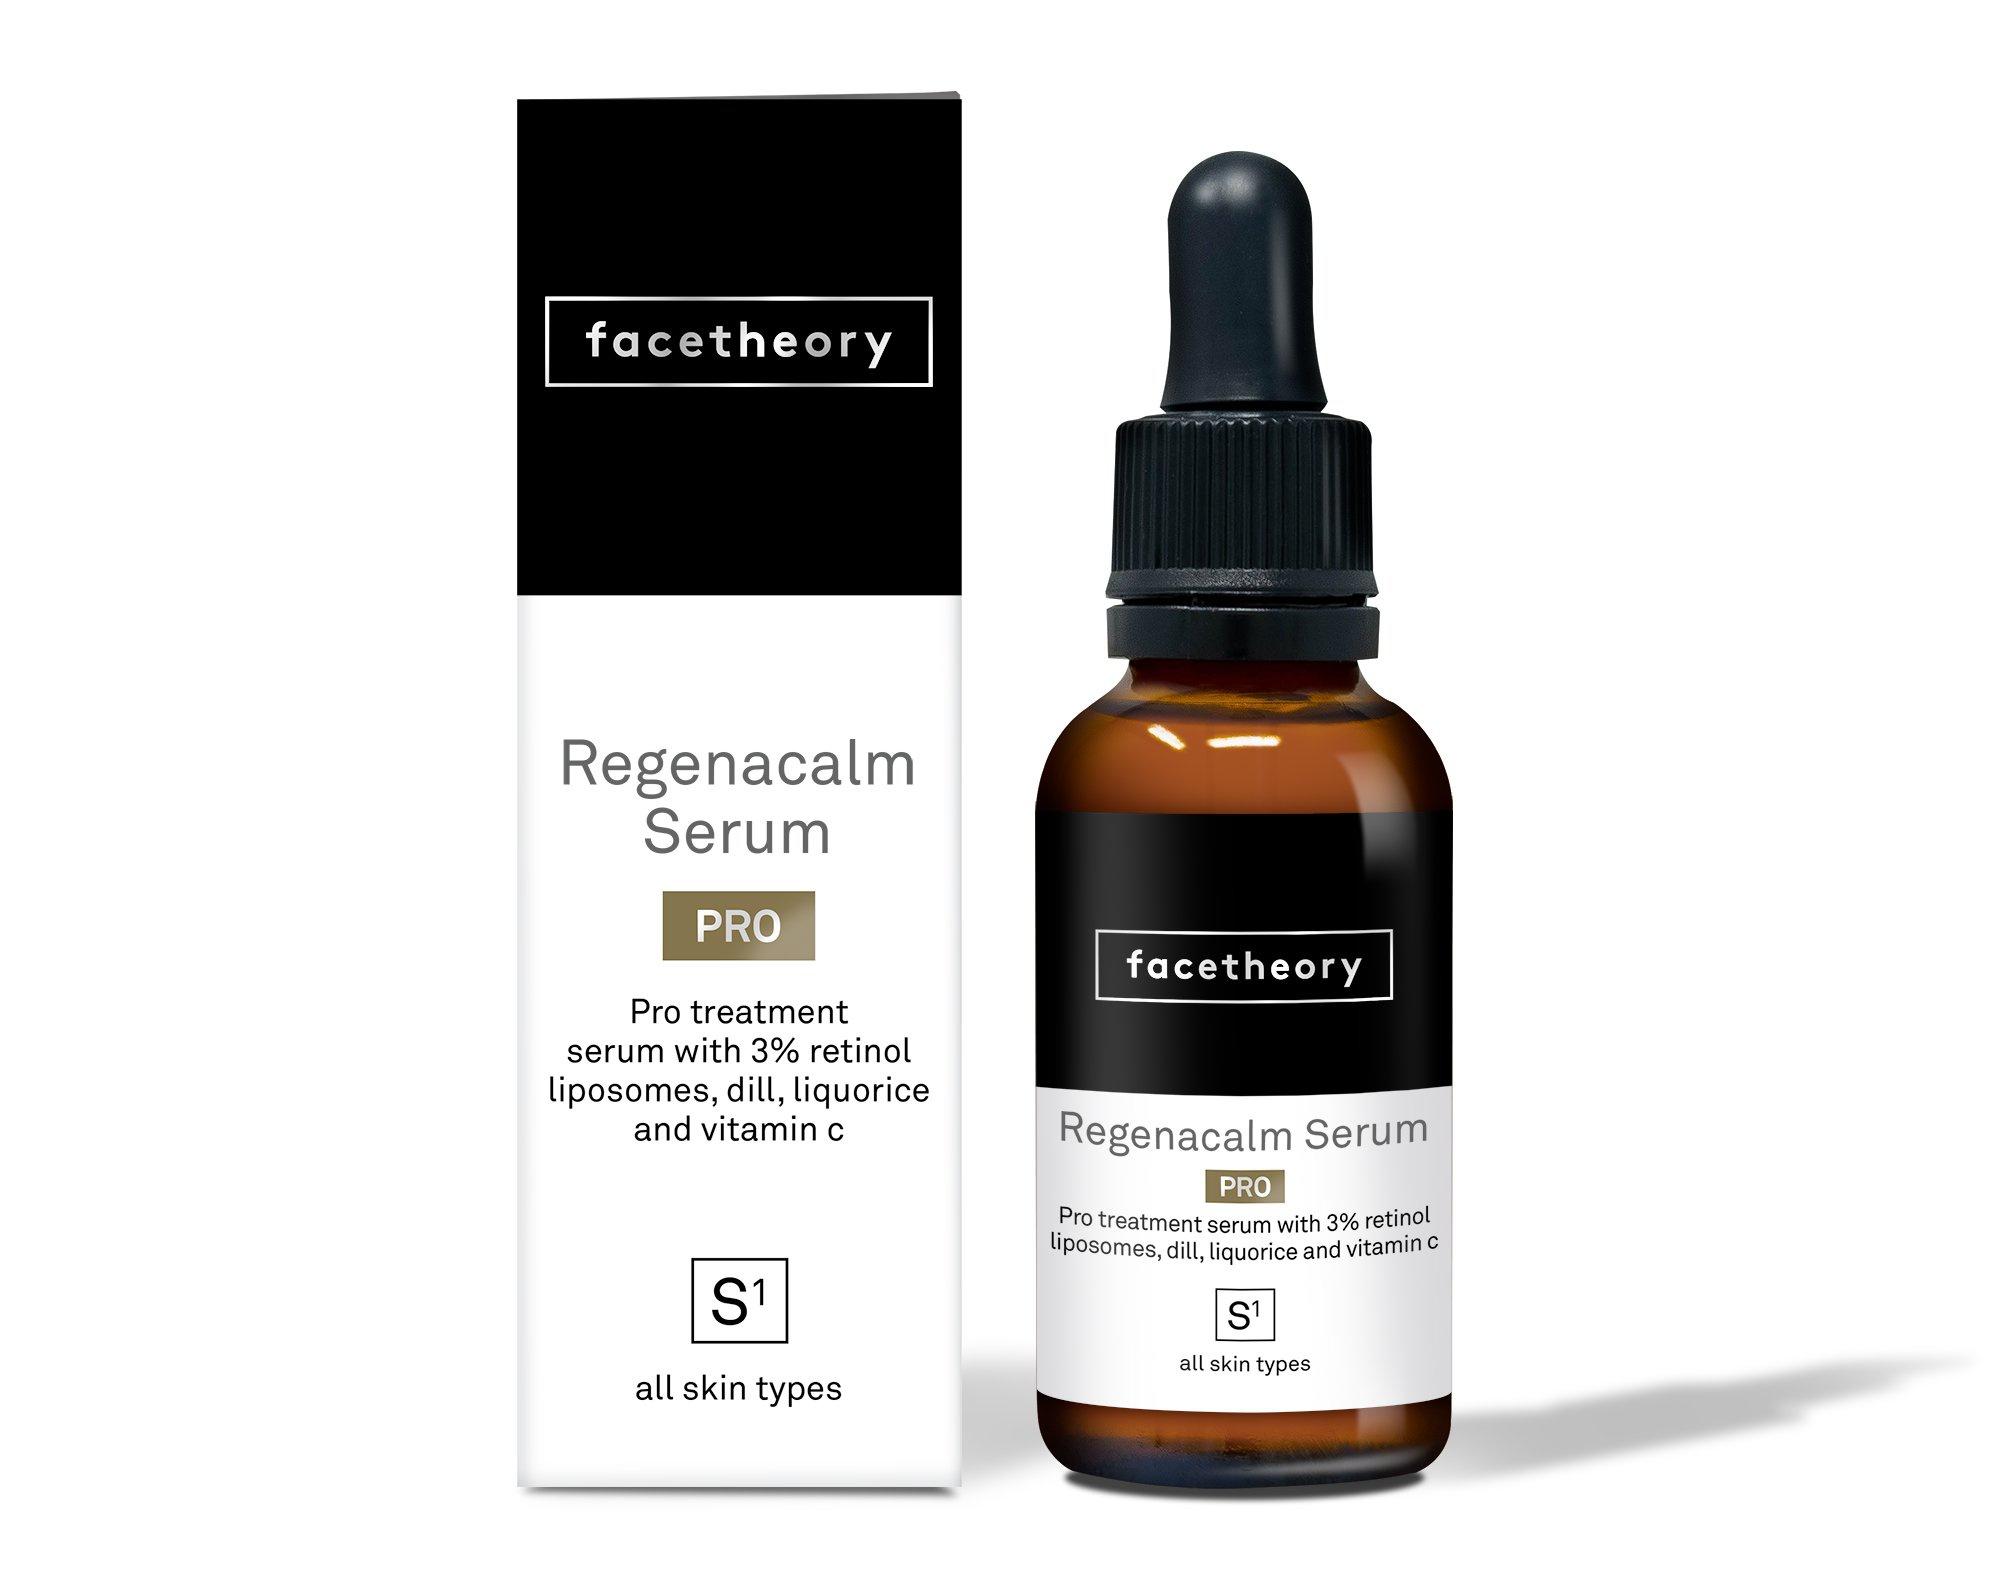 facetheory Regenecalm Serum Pro S1